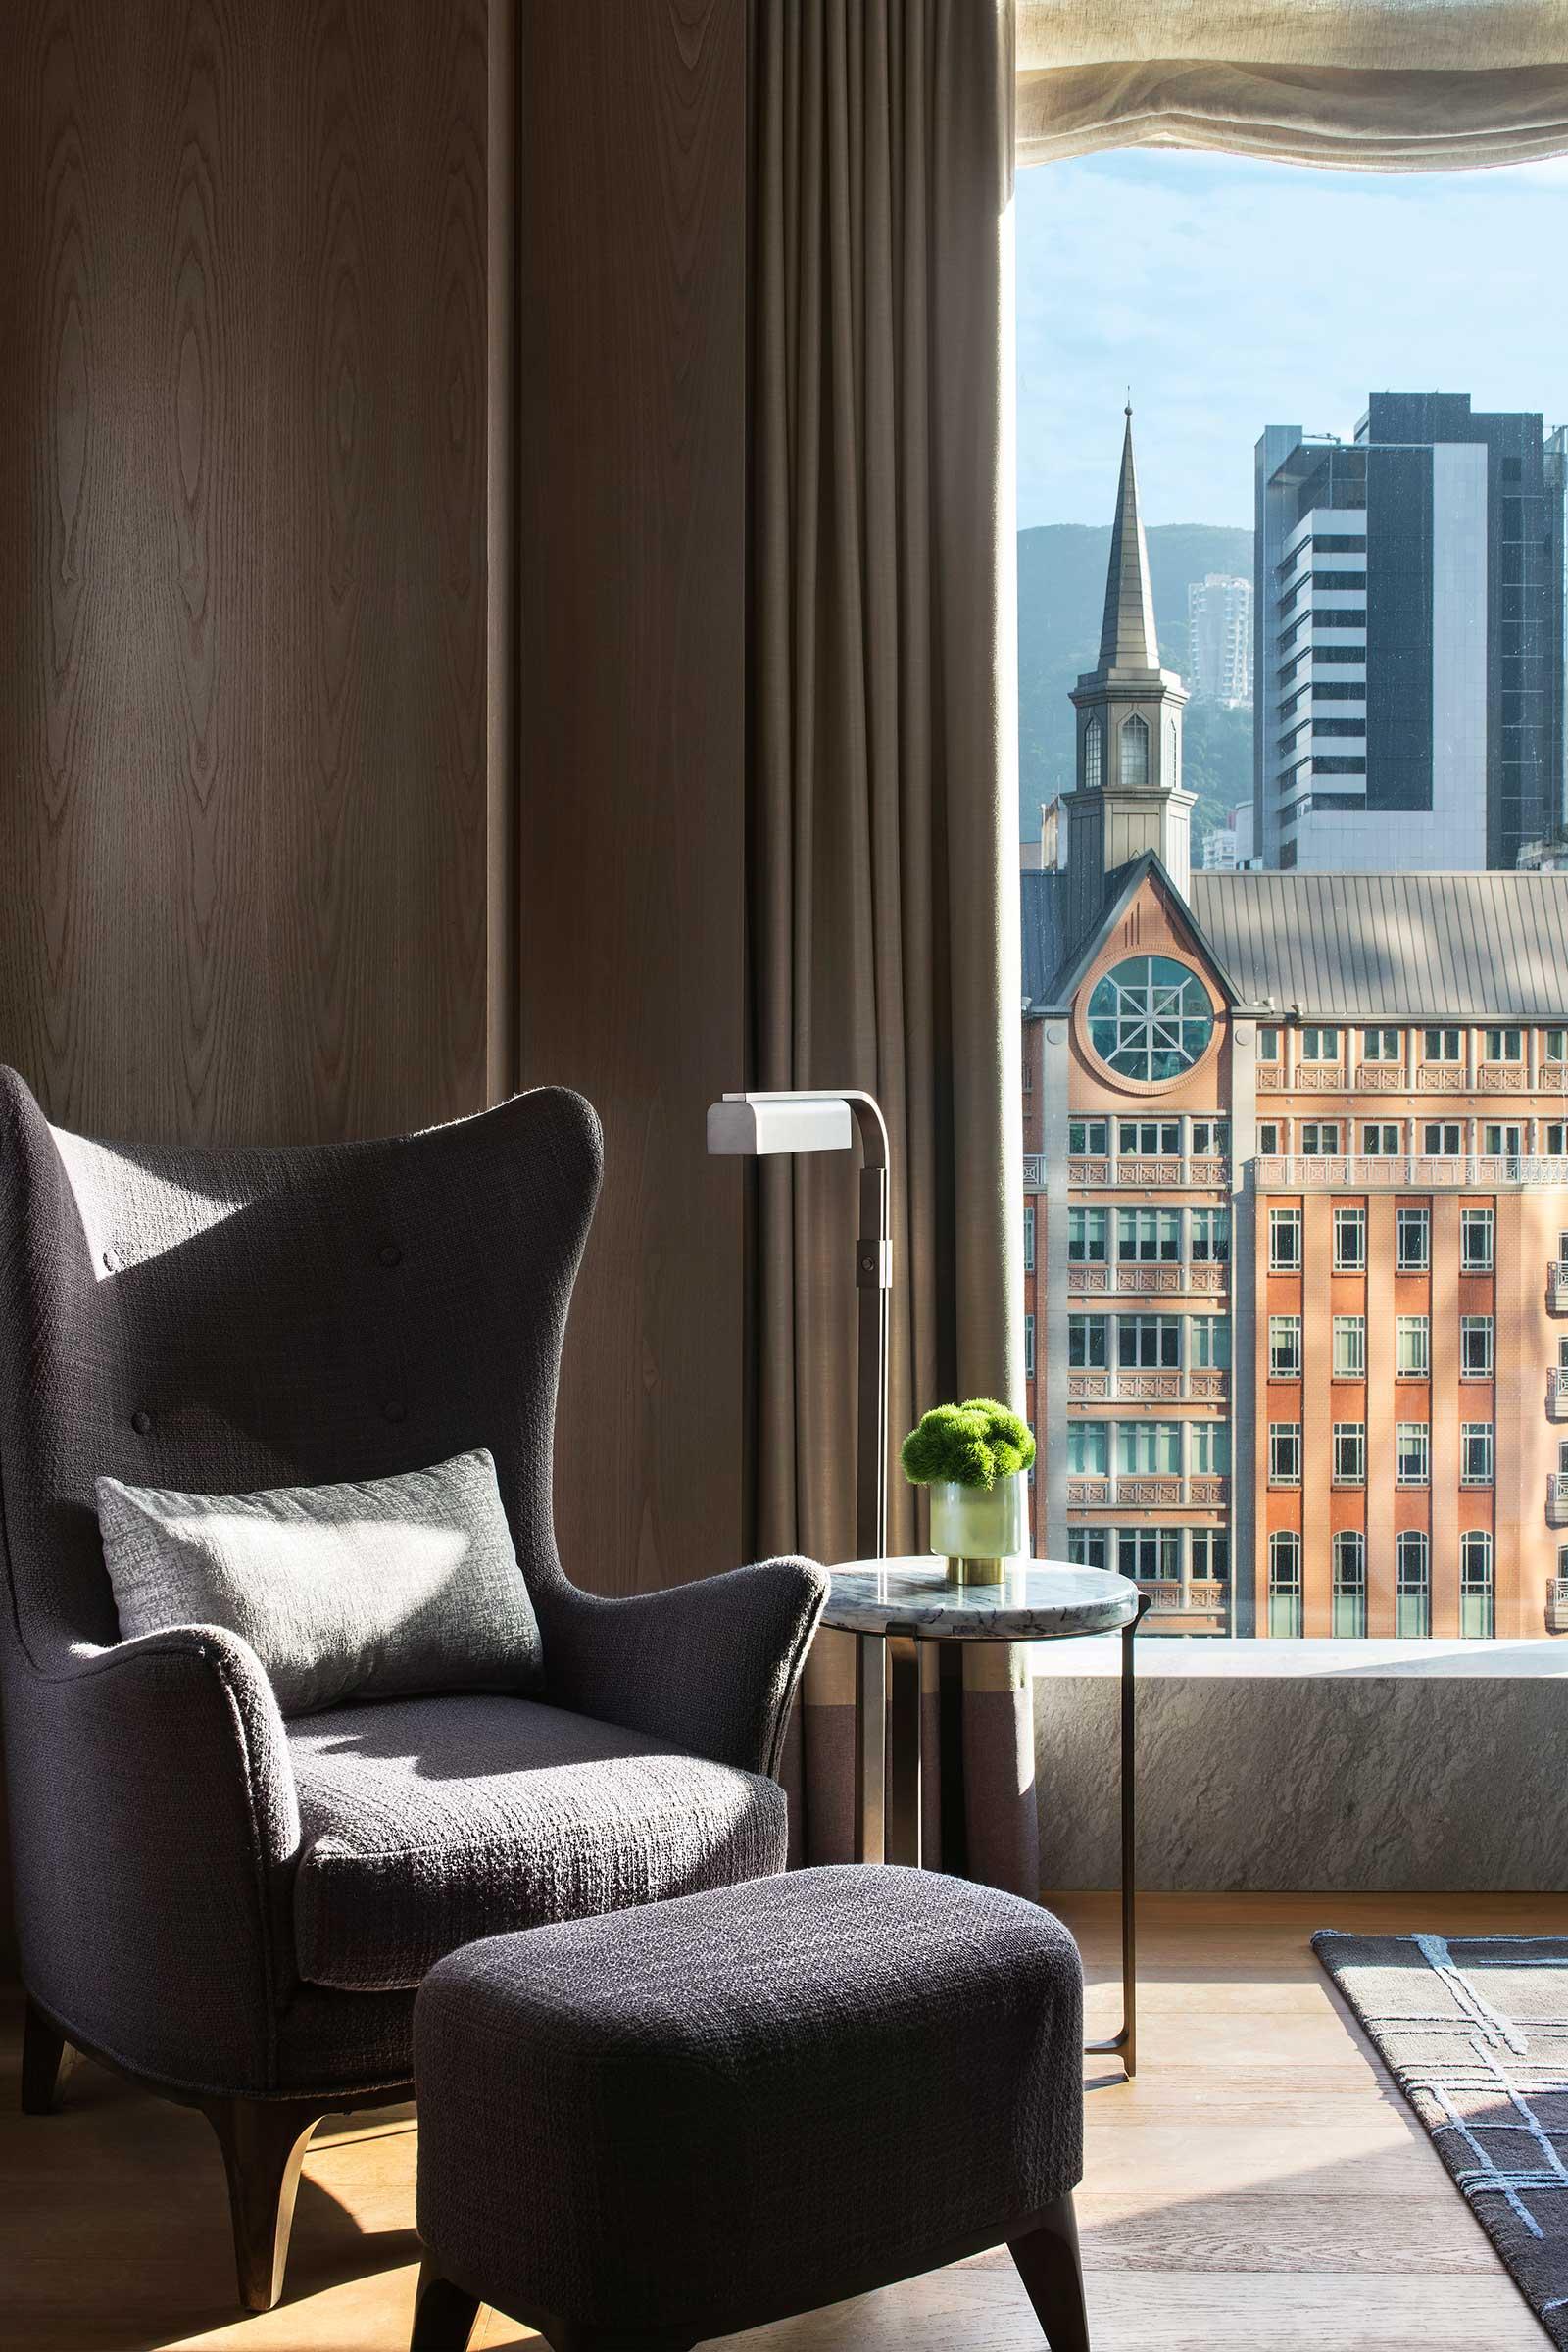 St.-Regis-Hong-Kong,-Guest-Room-Sofa-Seat-Vignette.jpg